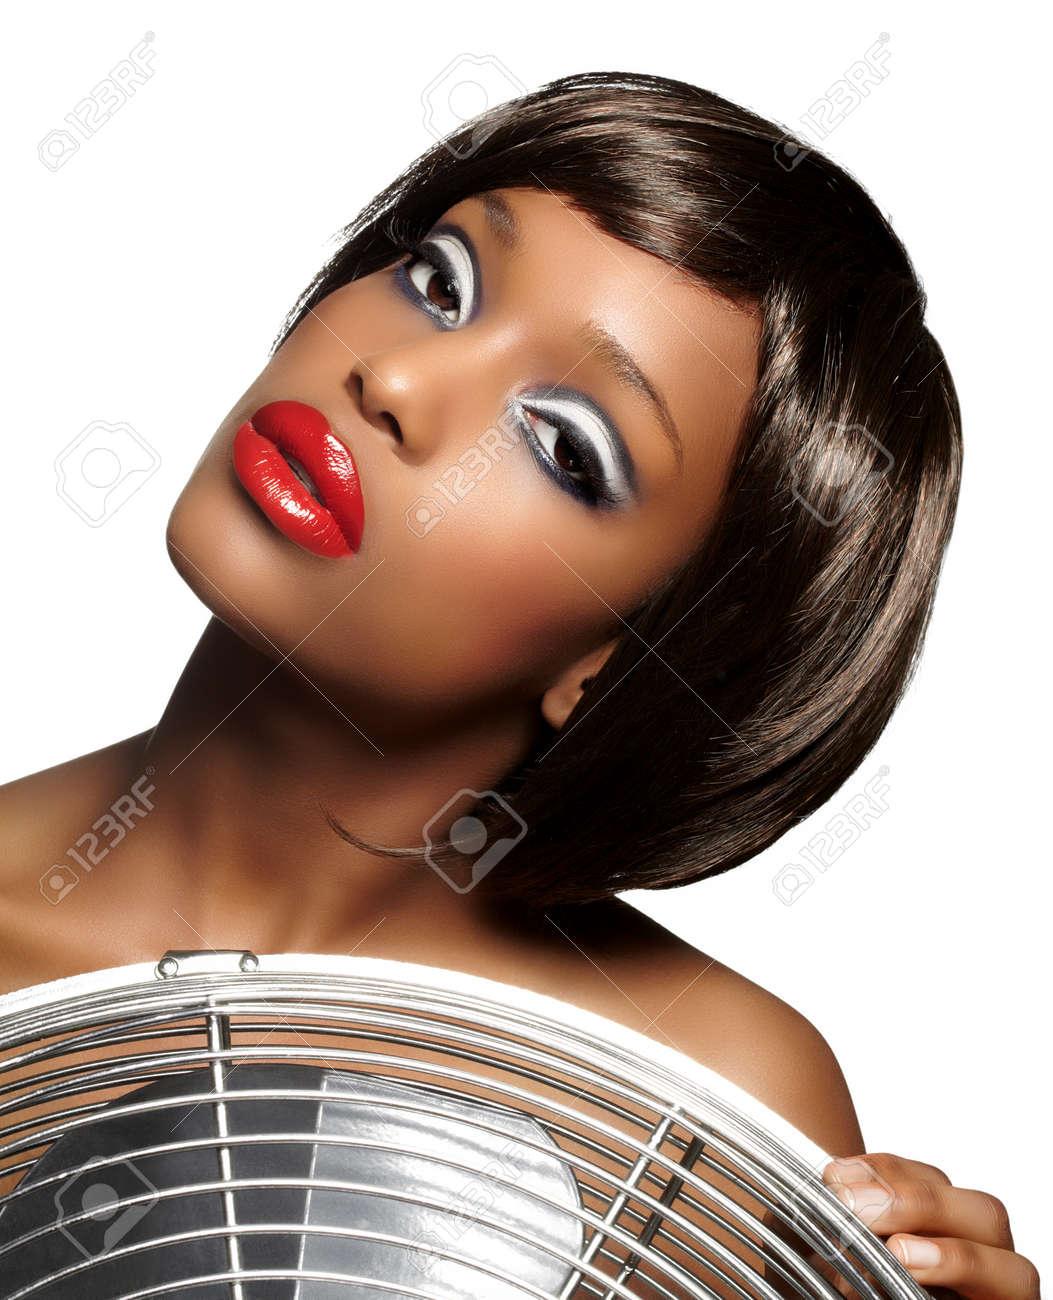 Beautiful Girl With Dark Skin Wearing Short Bob Wig And Retro